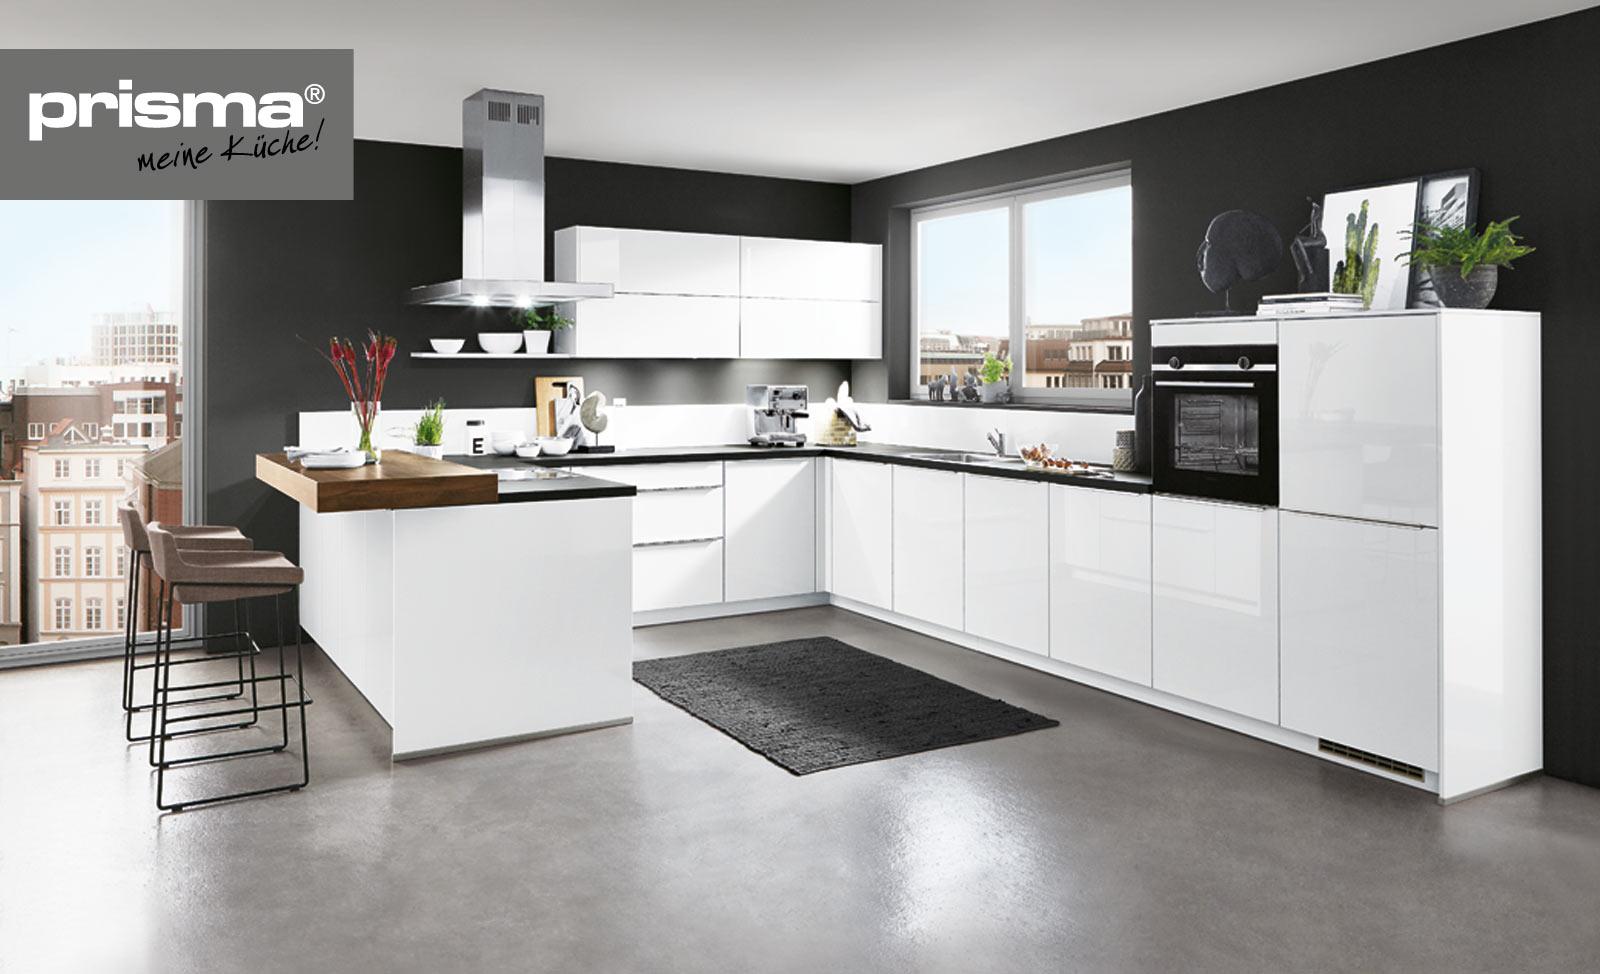 Full Size of Küche U Form Mit Elektrogeräten Küche U Form Ohne Geräte Küche U Form Mit Tisch Hochglanz Küche U Form Küche Küche U Form